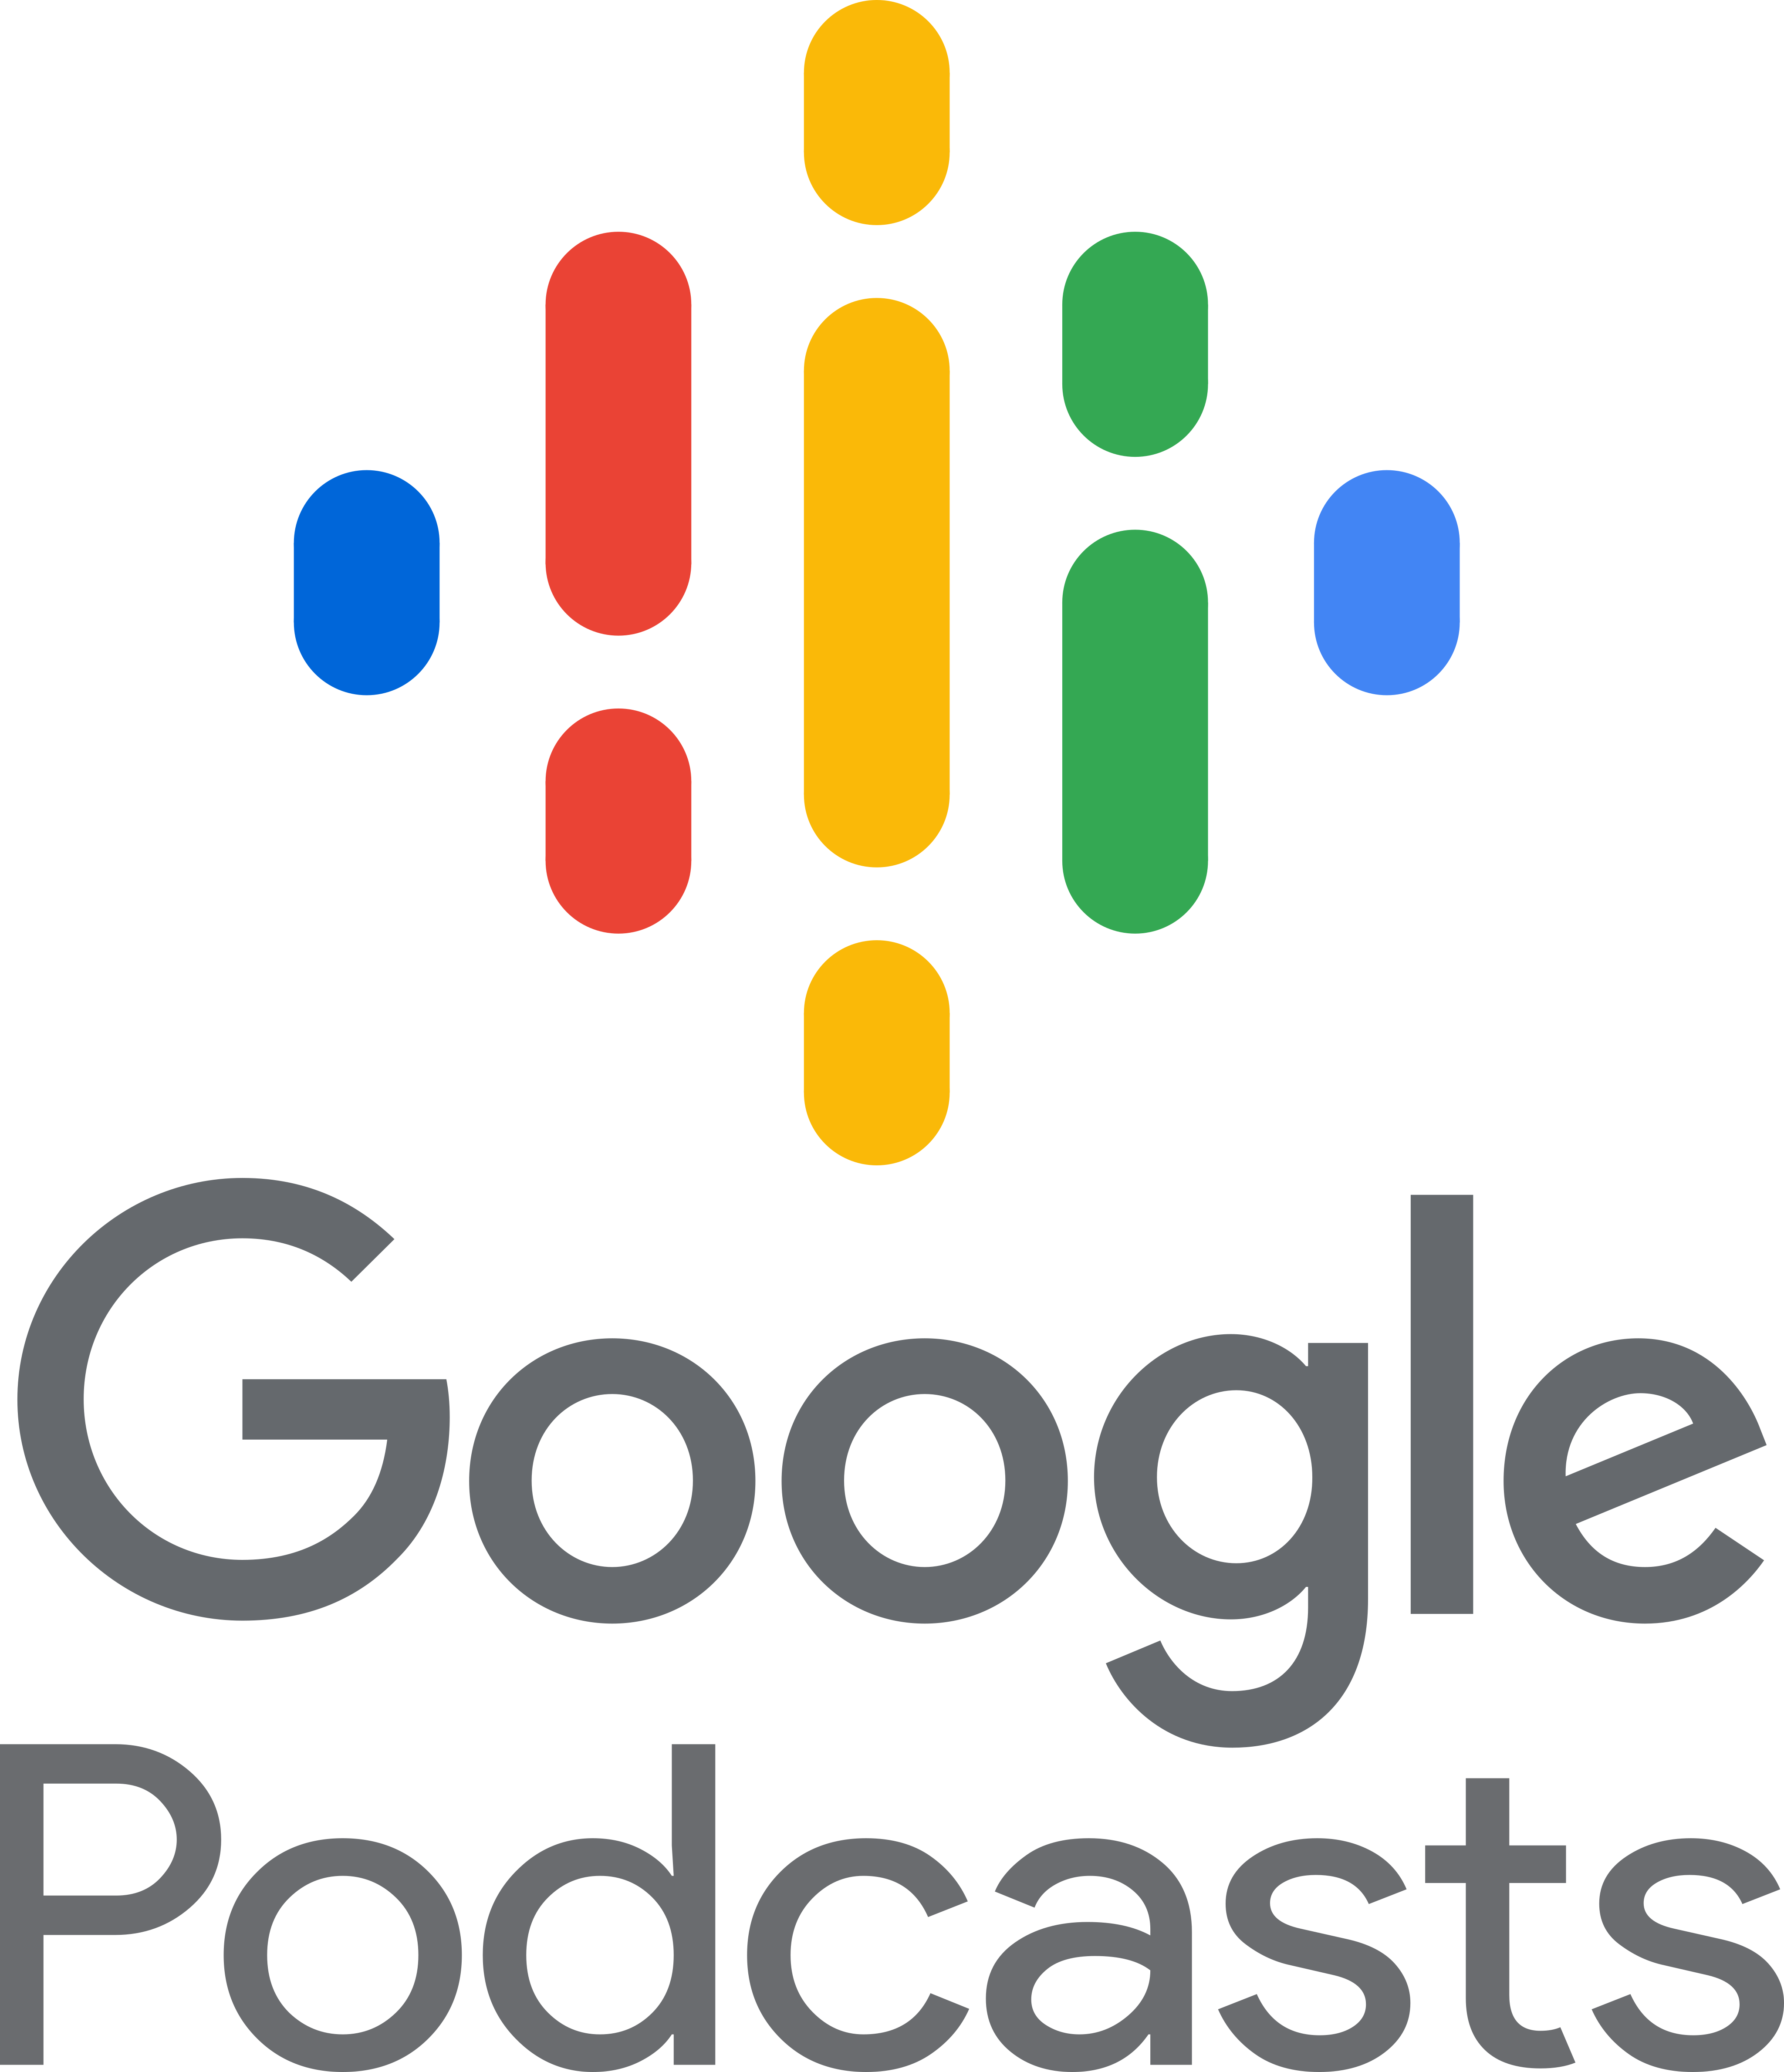 google-podcasts-logo-6